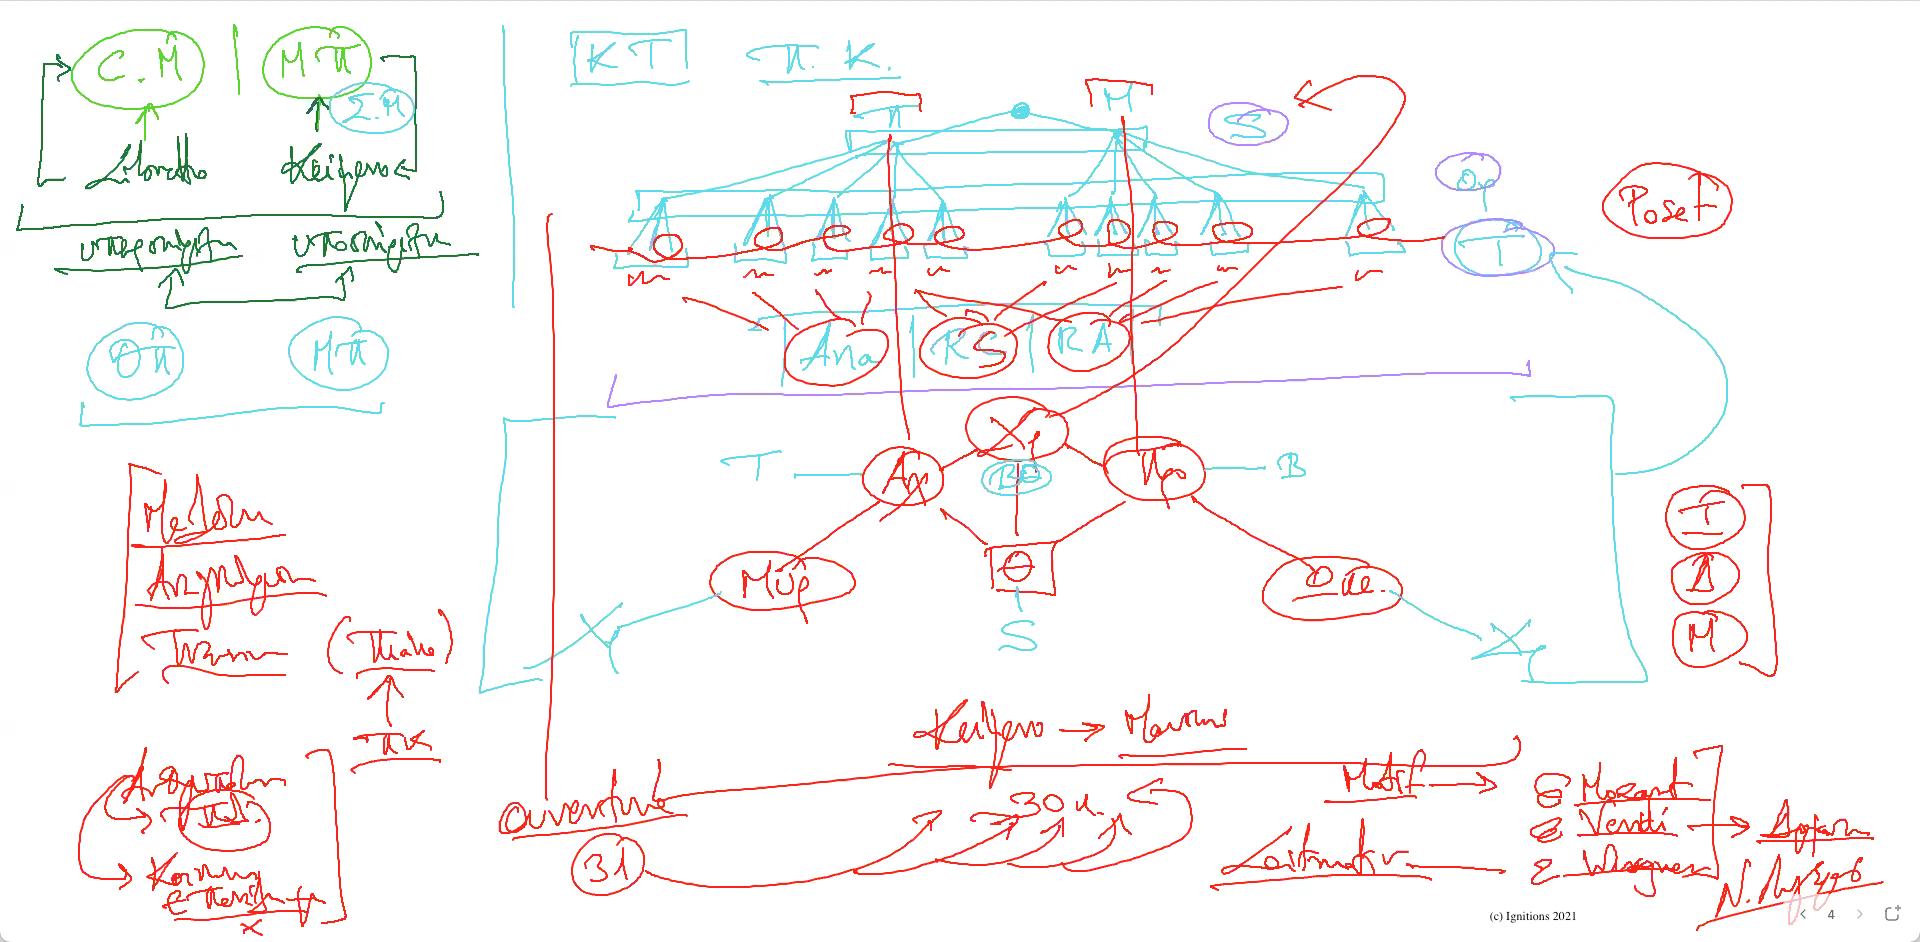 57616 - IV - Μέρος Ι - 6ο e-Masterclass Πολυκυκλικότητας. (Dessin)